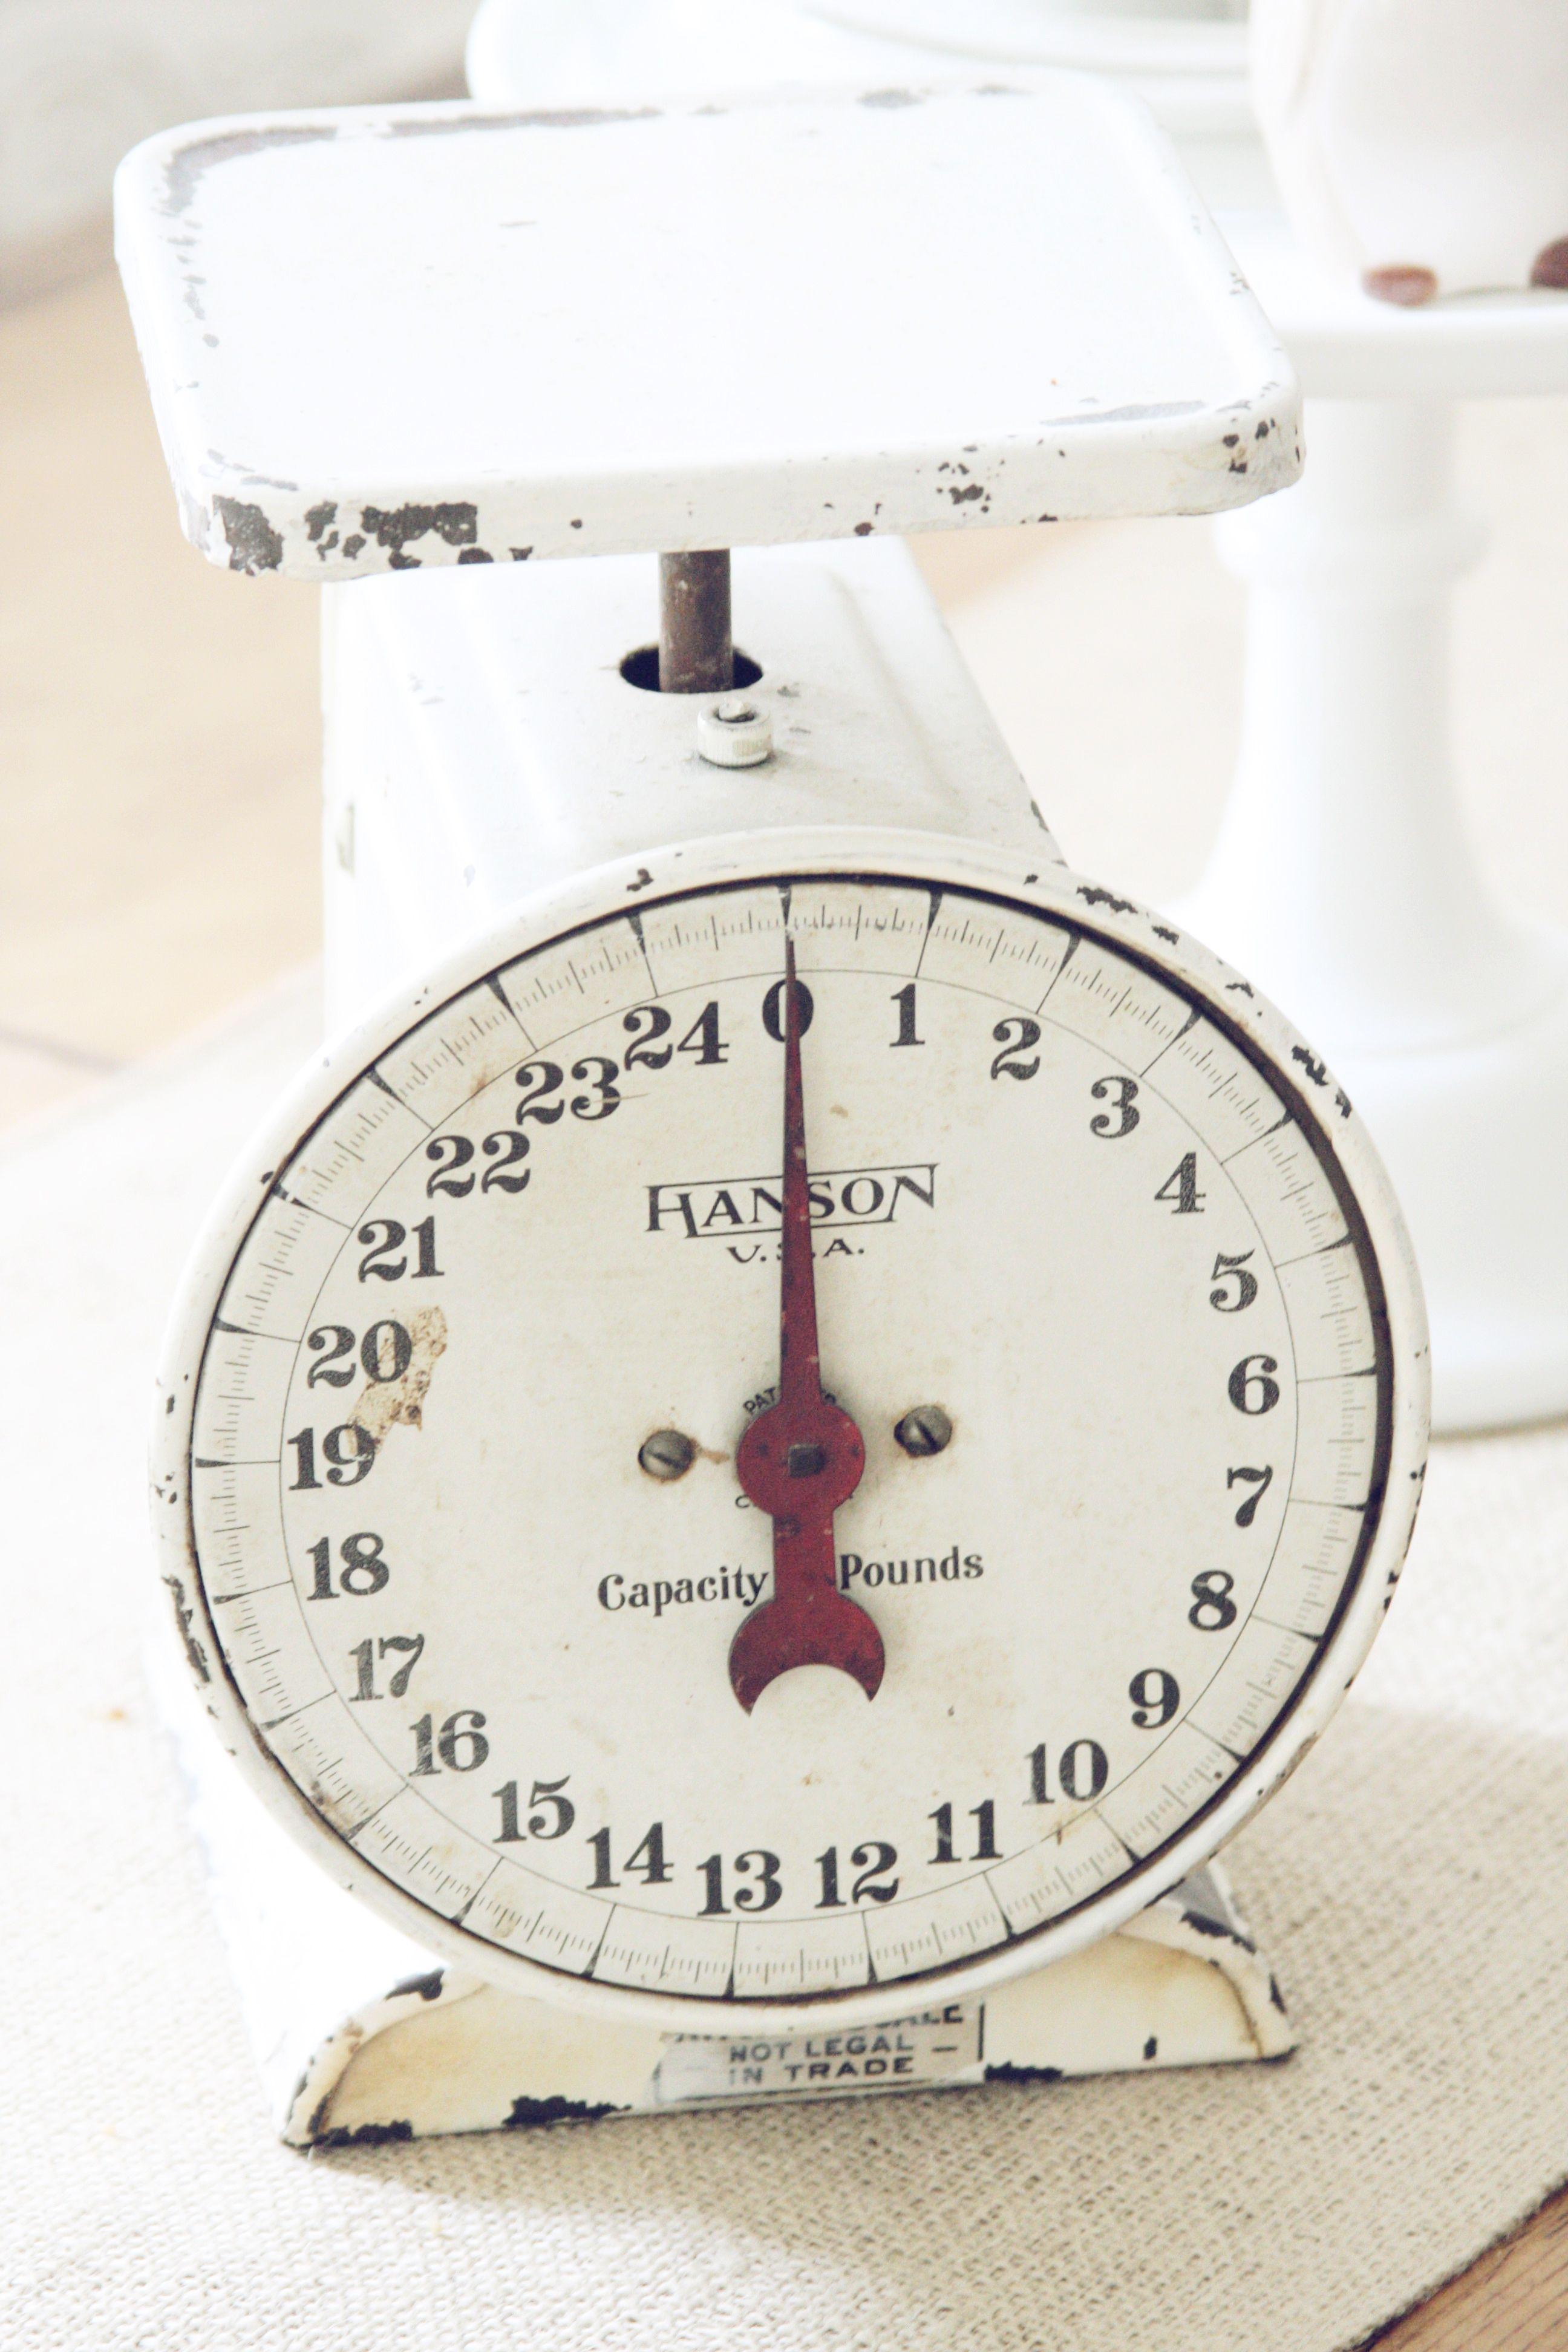 Vintage Creme Kitchen Scale~blondiensc.etsy.com | little things I ...